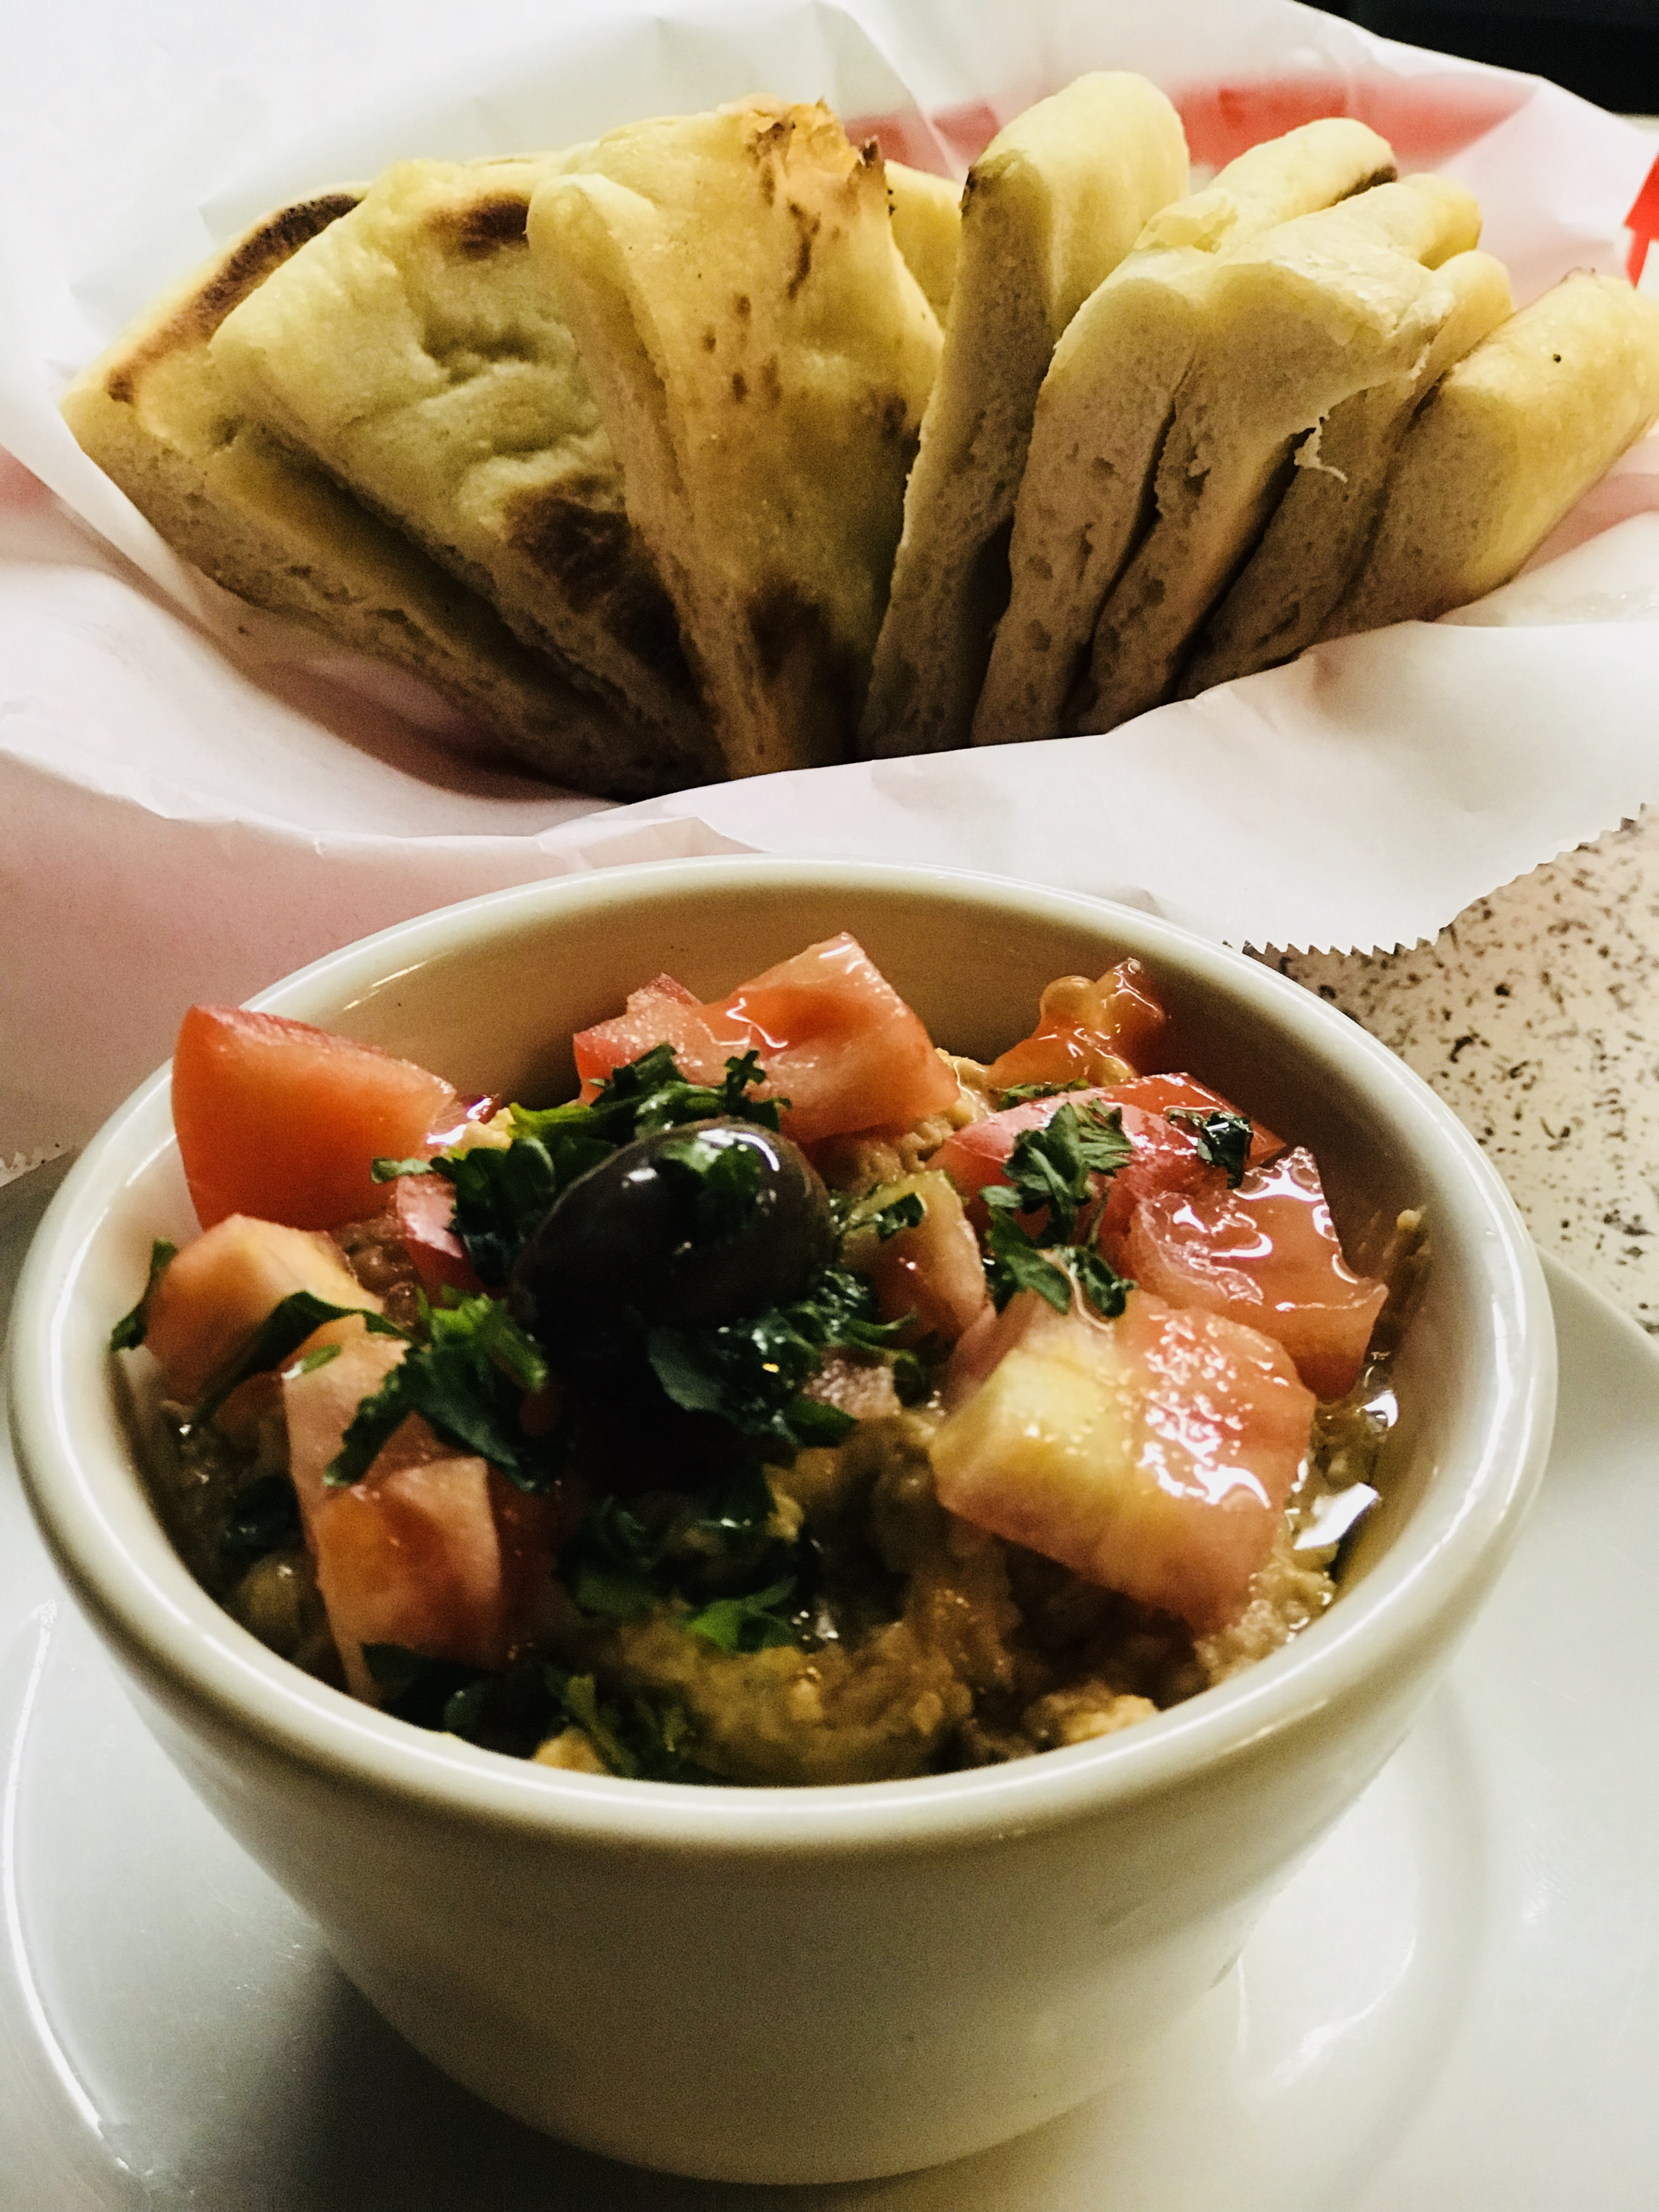 Hummus & Homemade Pita